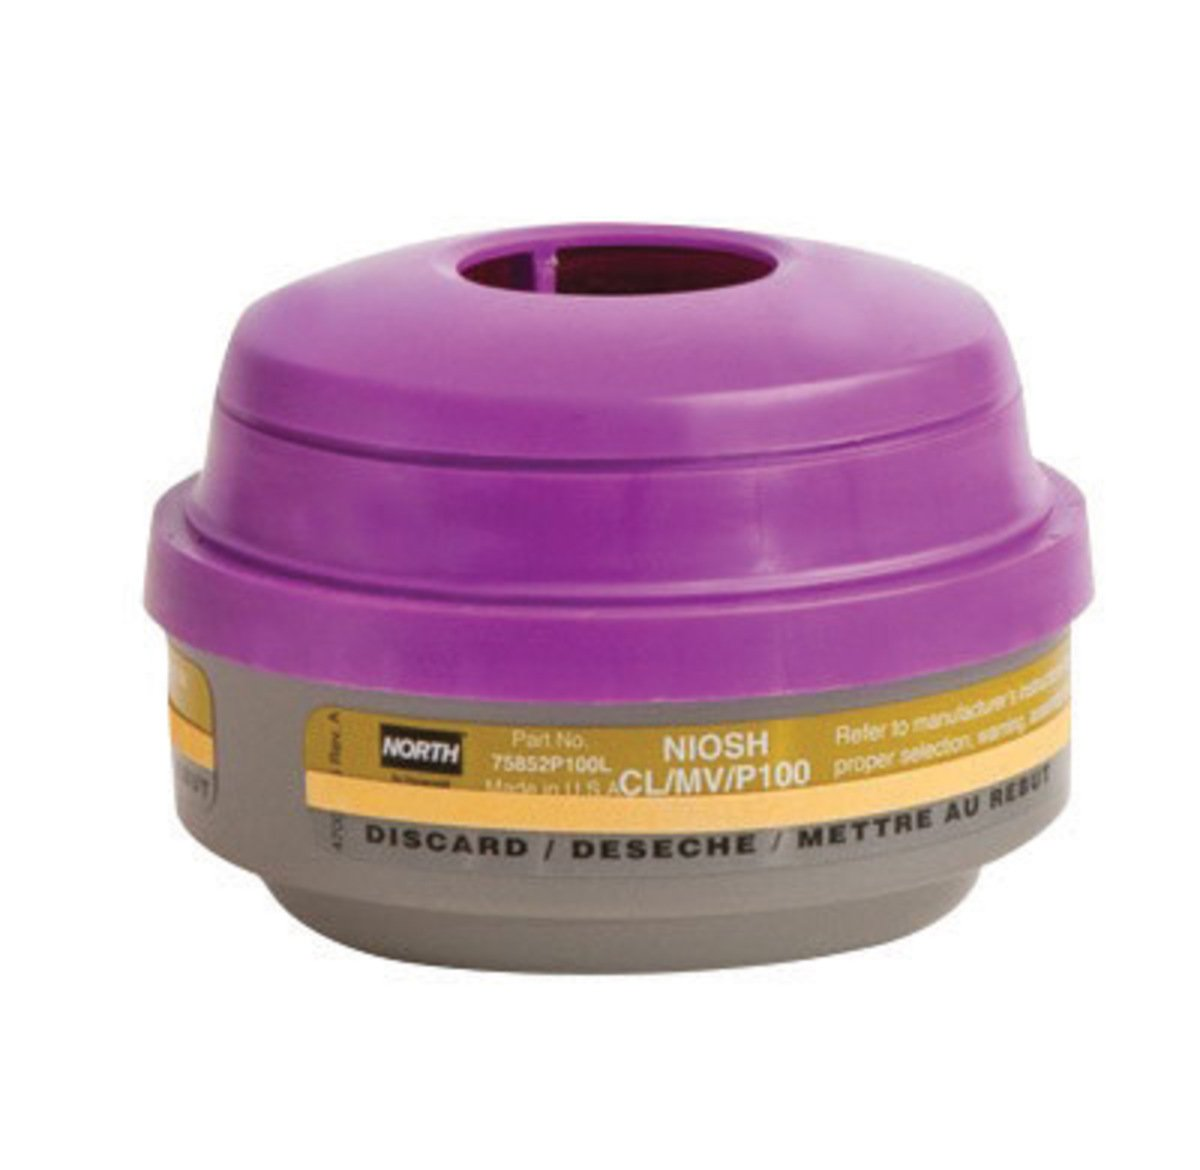 Honeywell 75852P100L Chlorine/Mercury Vapors/Particulate P100 APR Cartridge for 5500, 7700, 5400 and 7600 Series Respirators (1/PK)